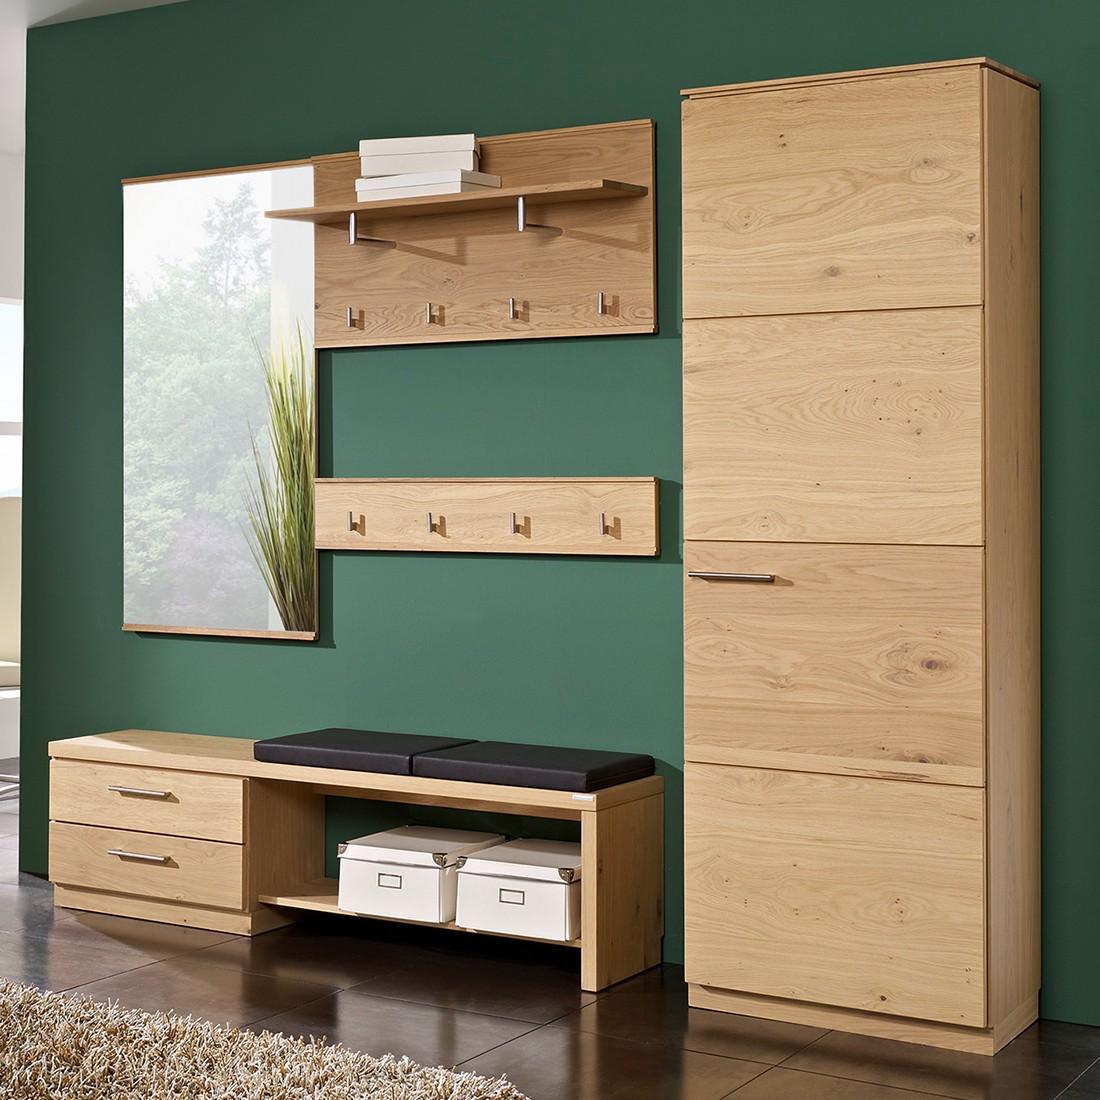 garderobenset vasco ii 5 teilig inkl sitzkissen. Black Bedroom Furniture Sets. Home Design Ideas